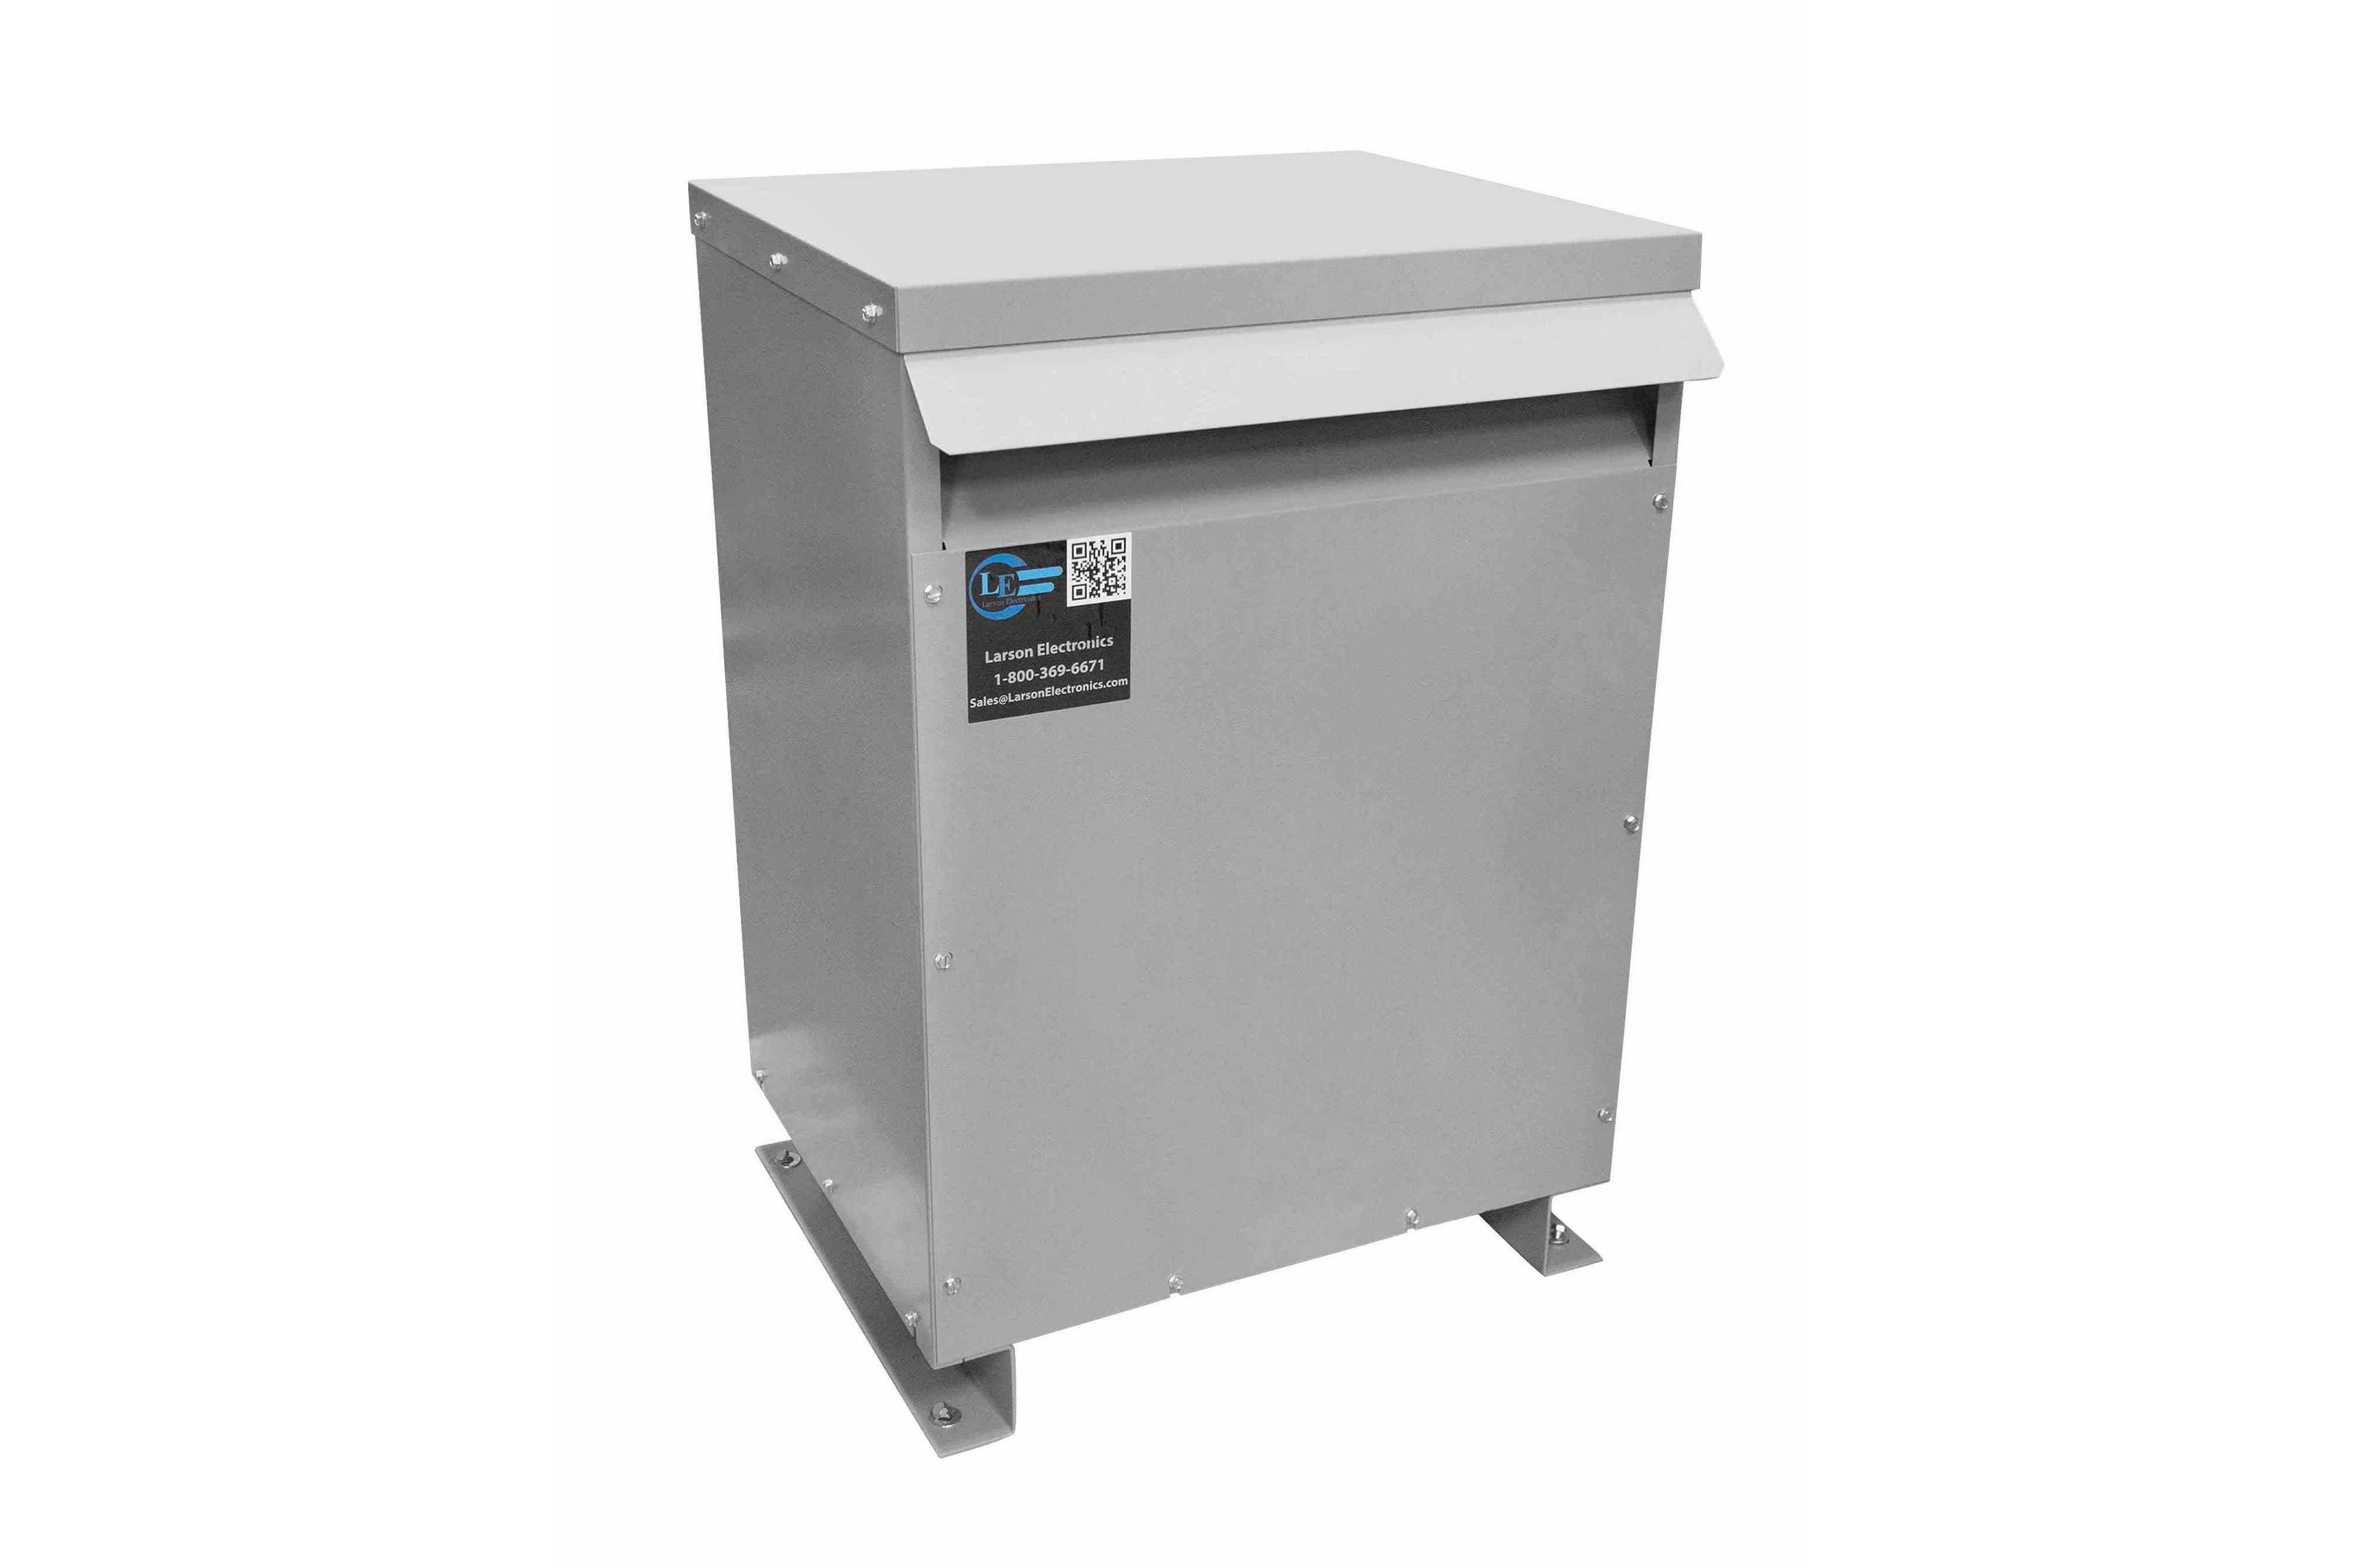 36 kVA 3PH DOE Transformer, 575V Delta Primary, 415Y/240 Wye-N Secondary, N3R, Ventilated, 60 Hz